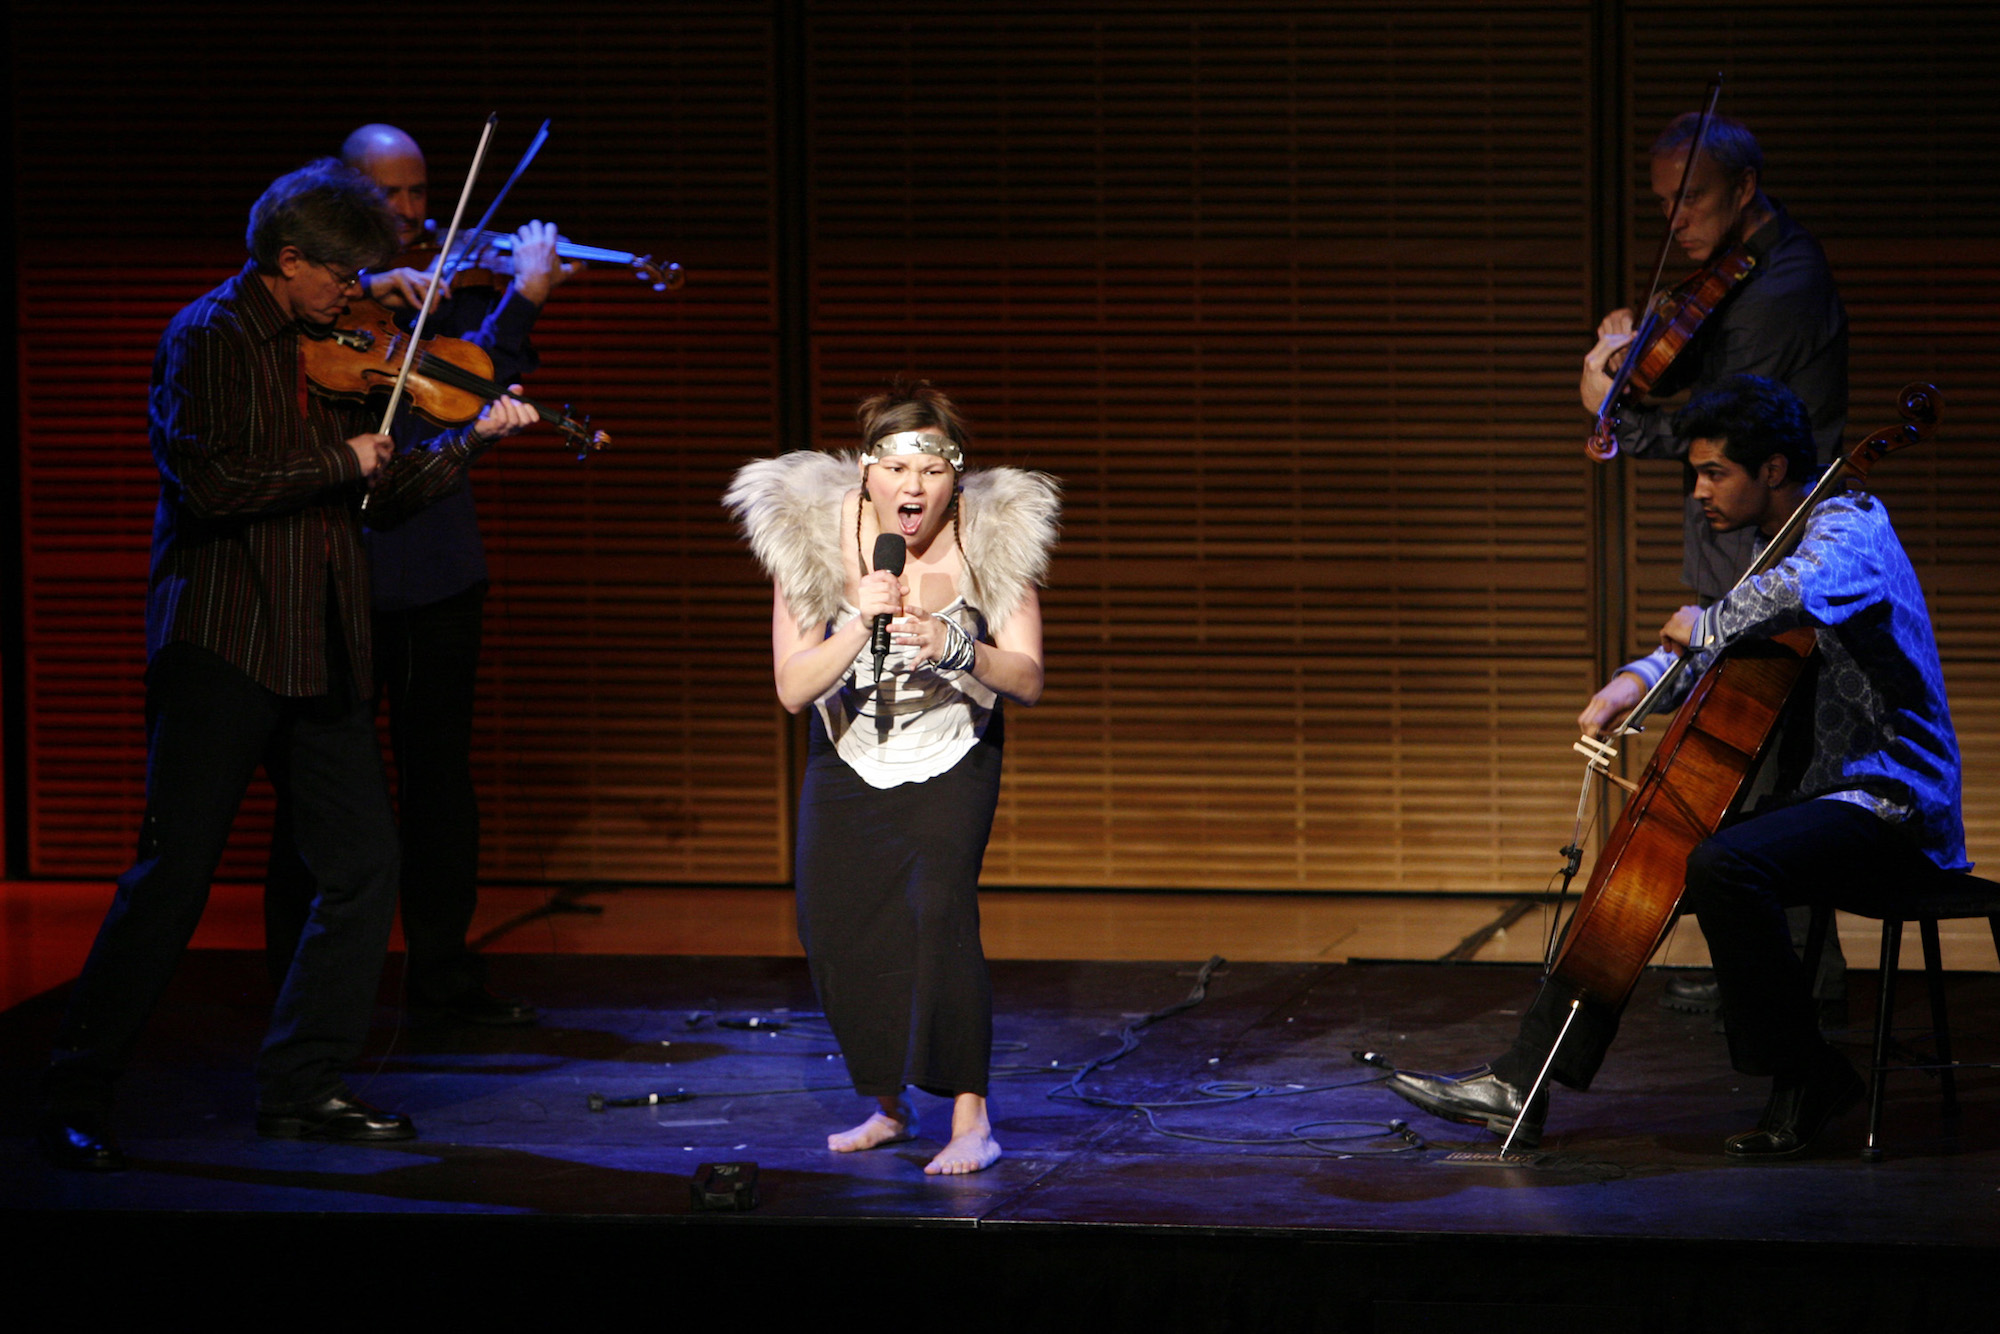 Kronos Quartet with Tanya Tagaq in 2006, credit Richard Termine